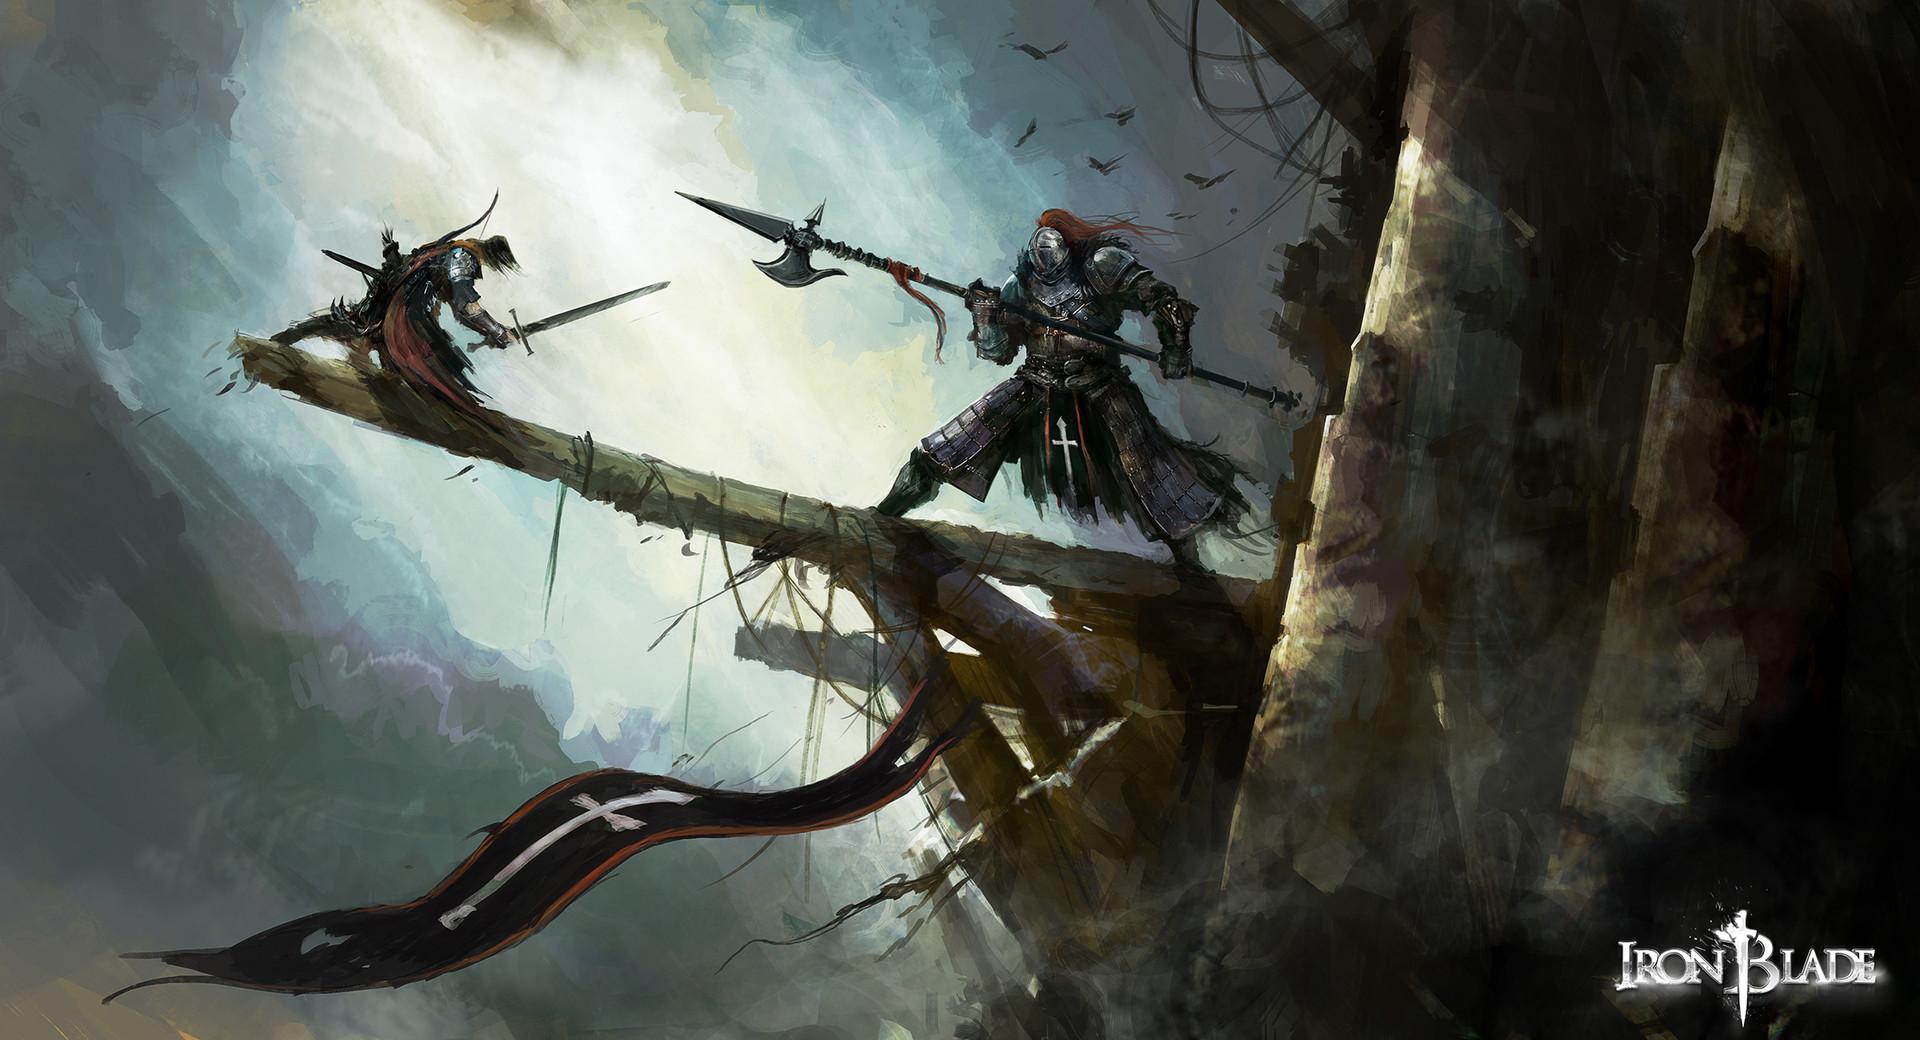 Alexandre chaudret gca characters ennemies situation 10